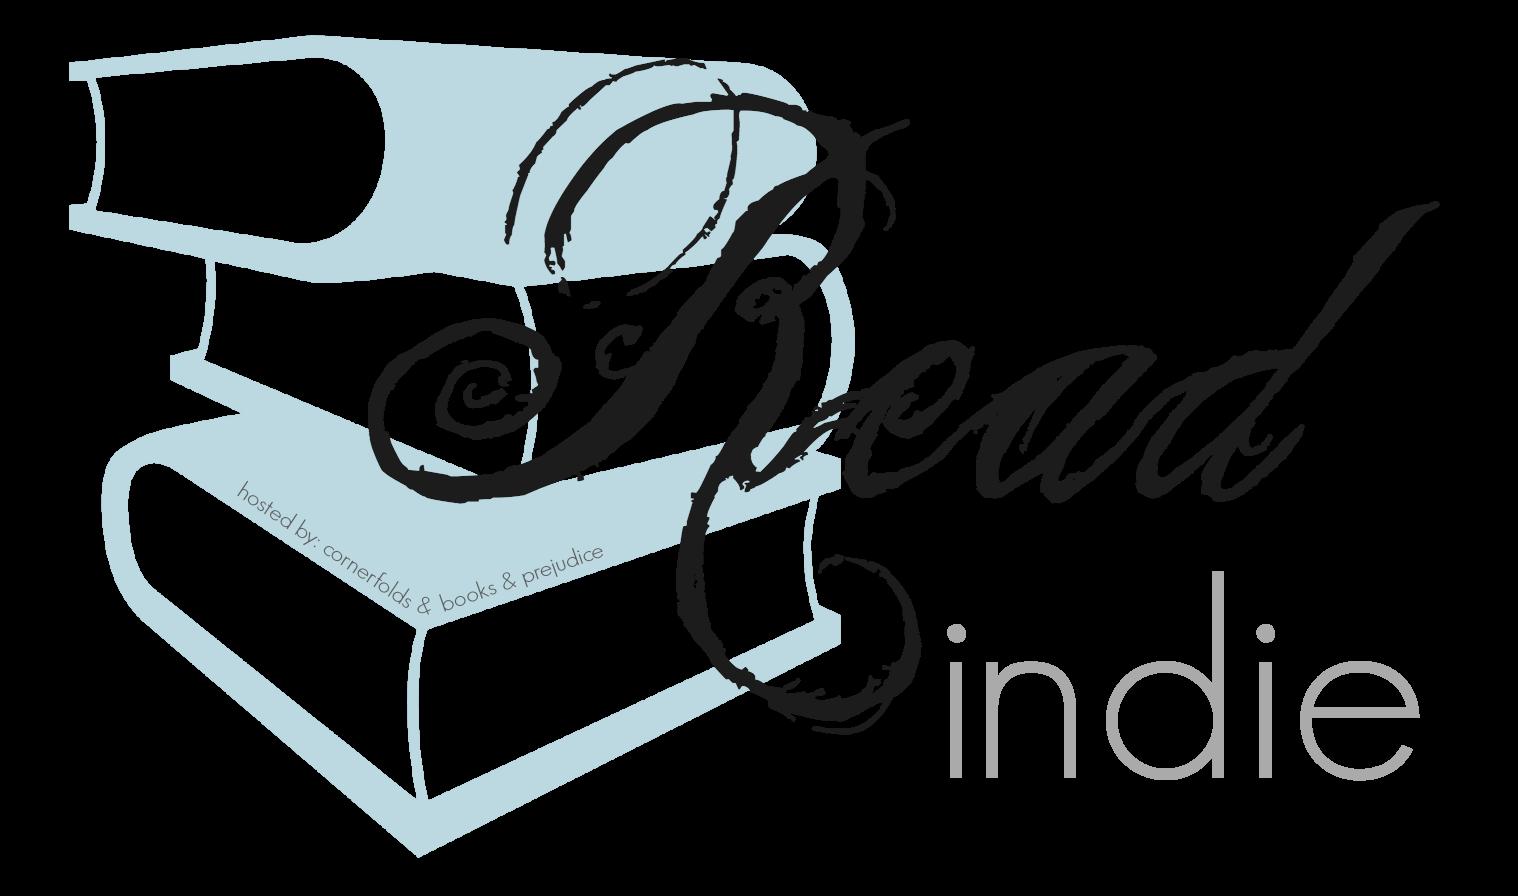 #ReadIndie Challenge – Sign-up